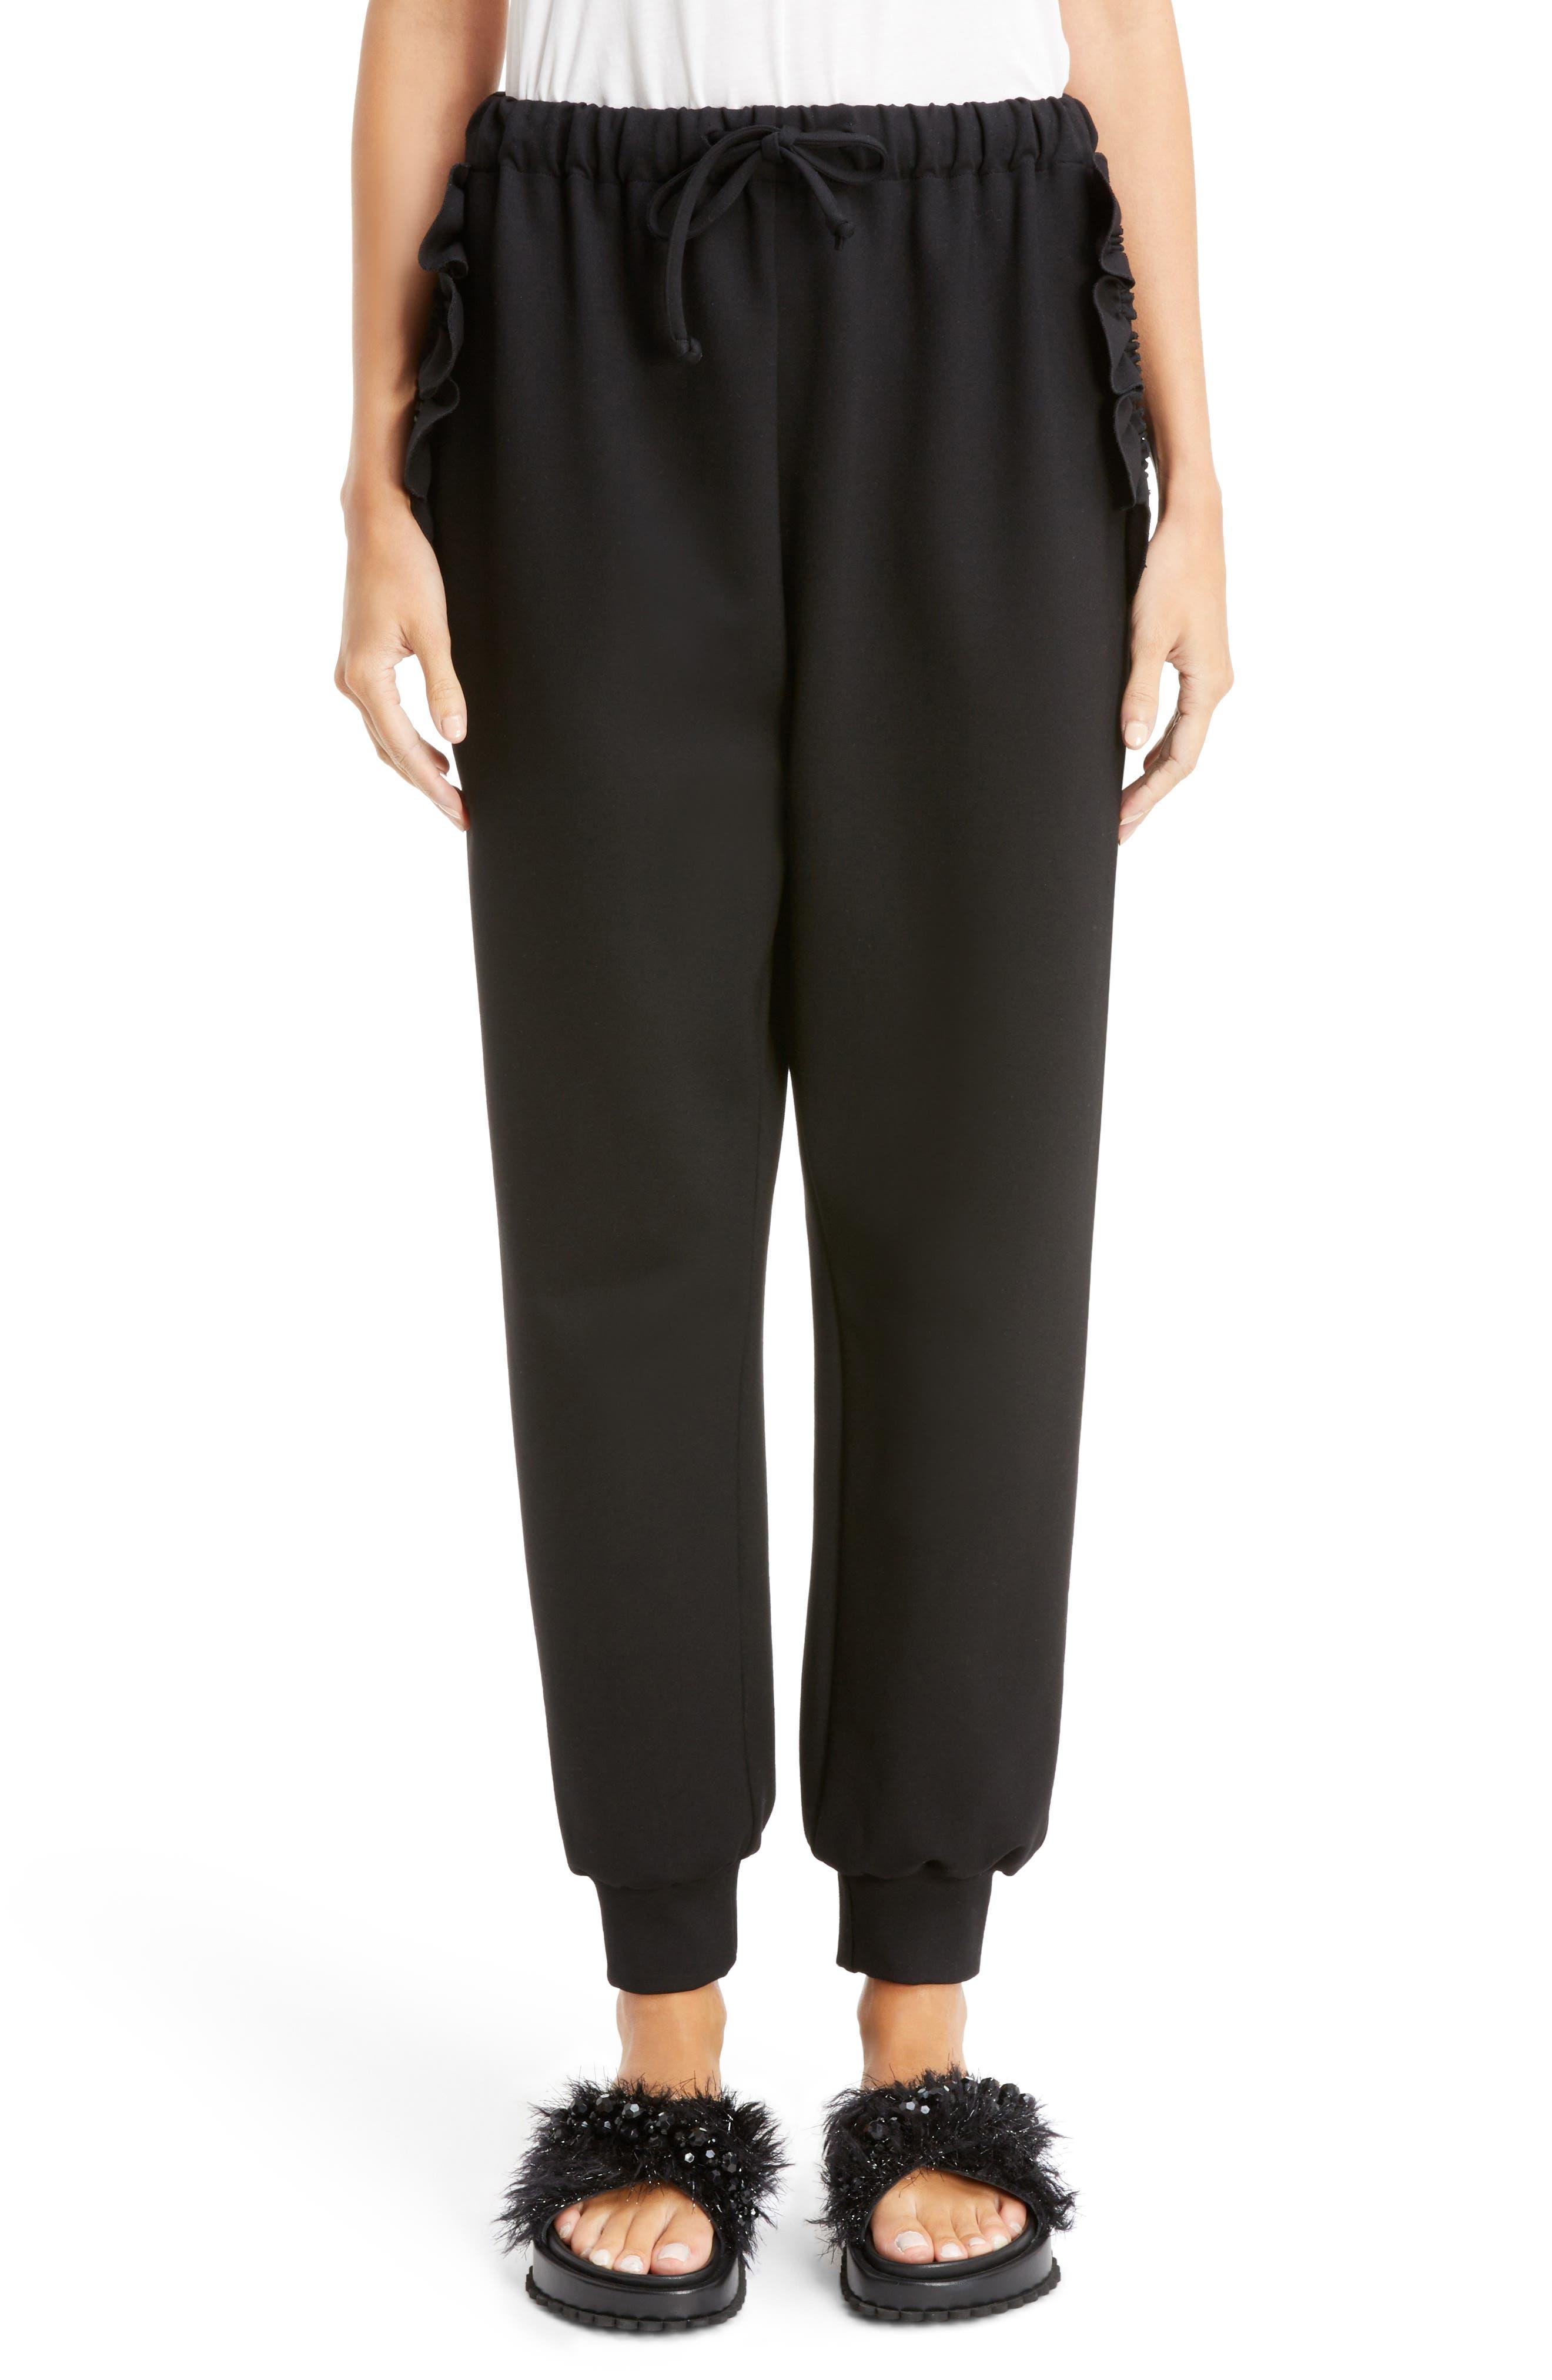 Alternate Image 1 Selected - Simone Rocha Ruffle Embellished Jogging Pants